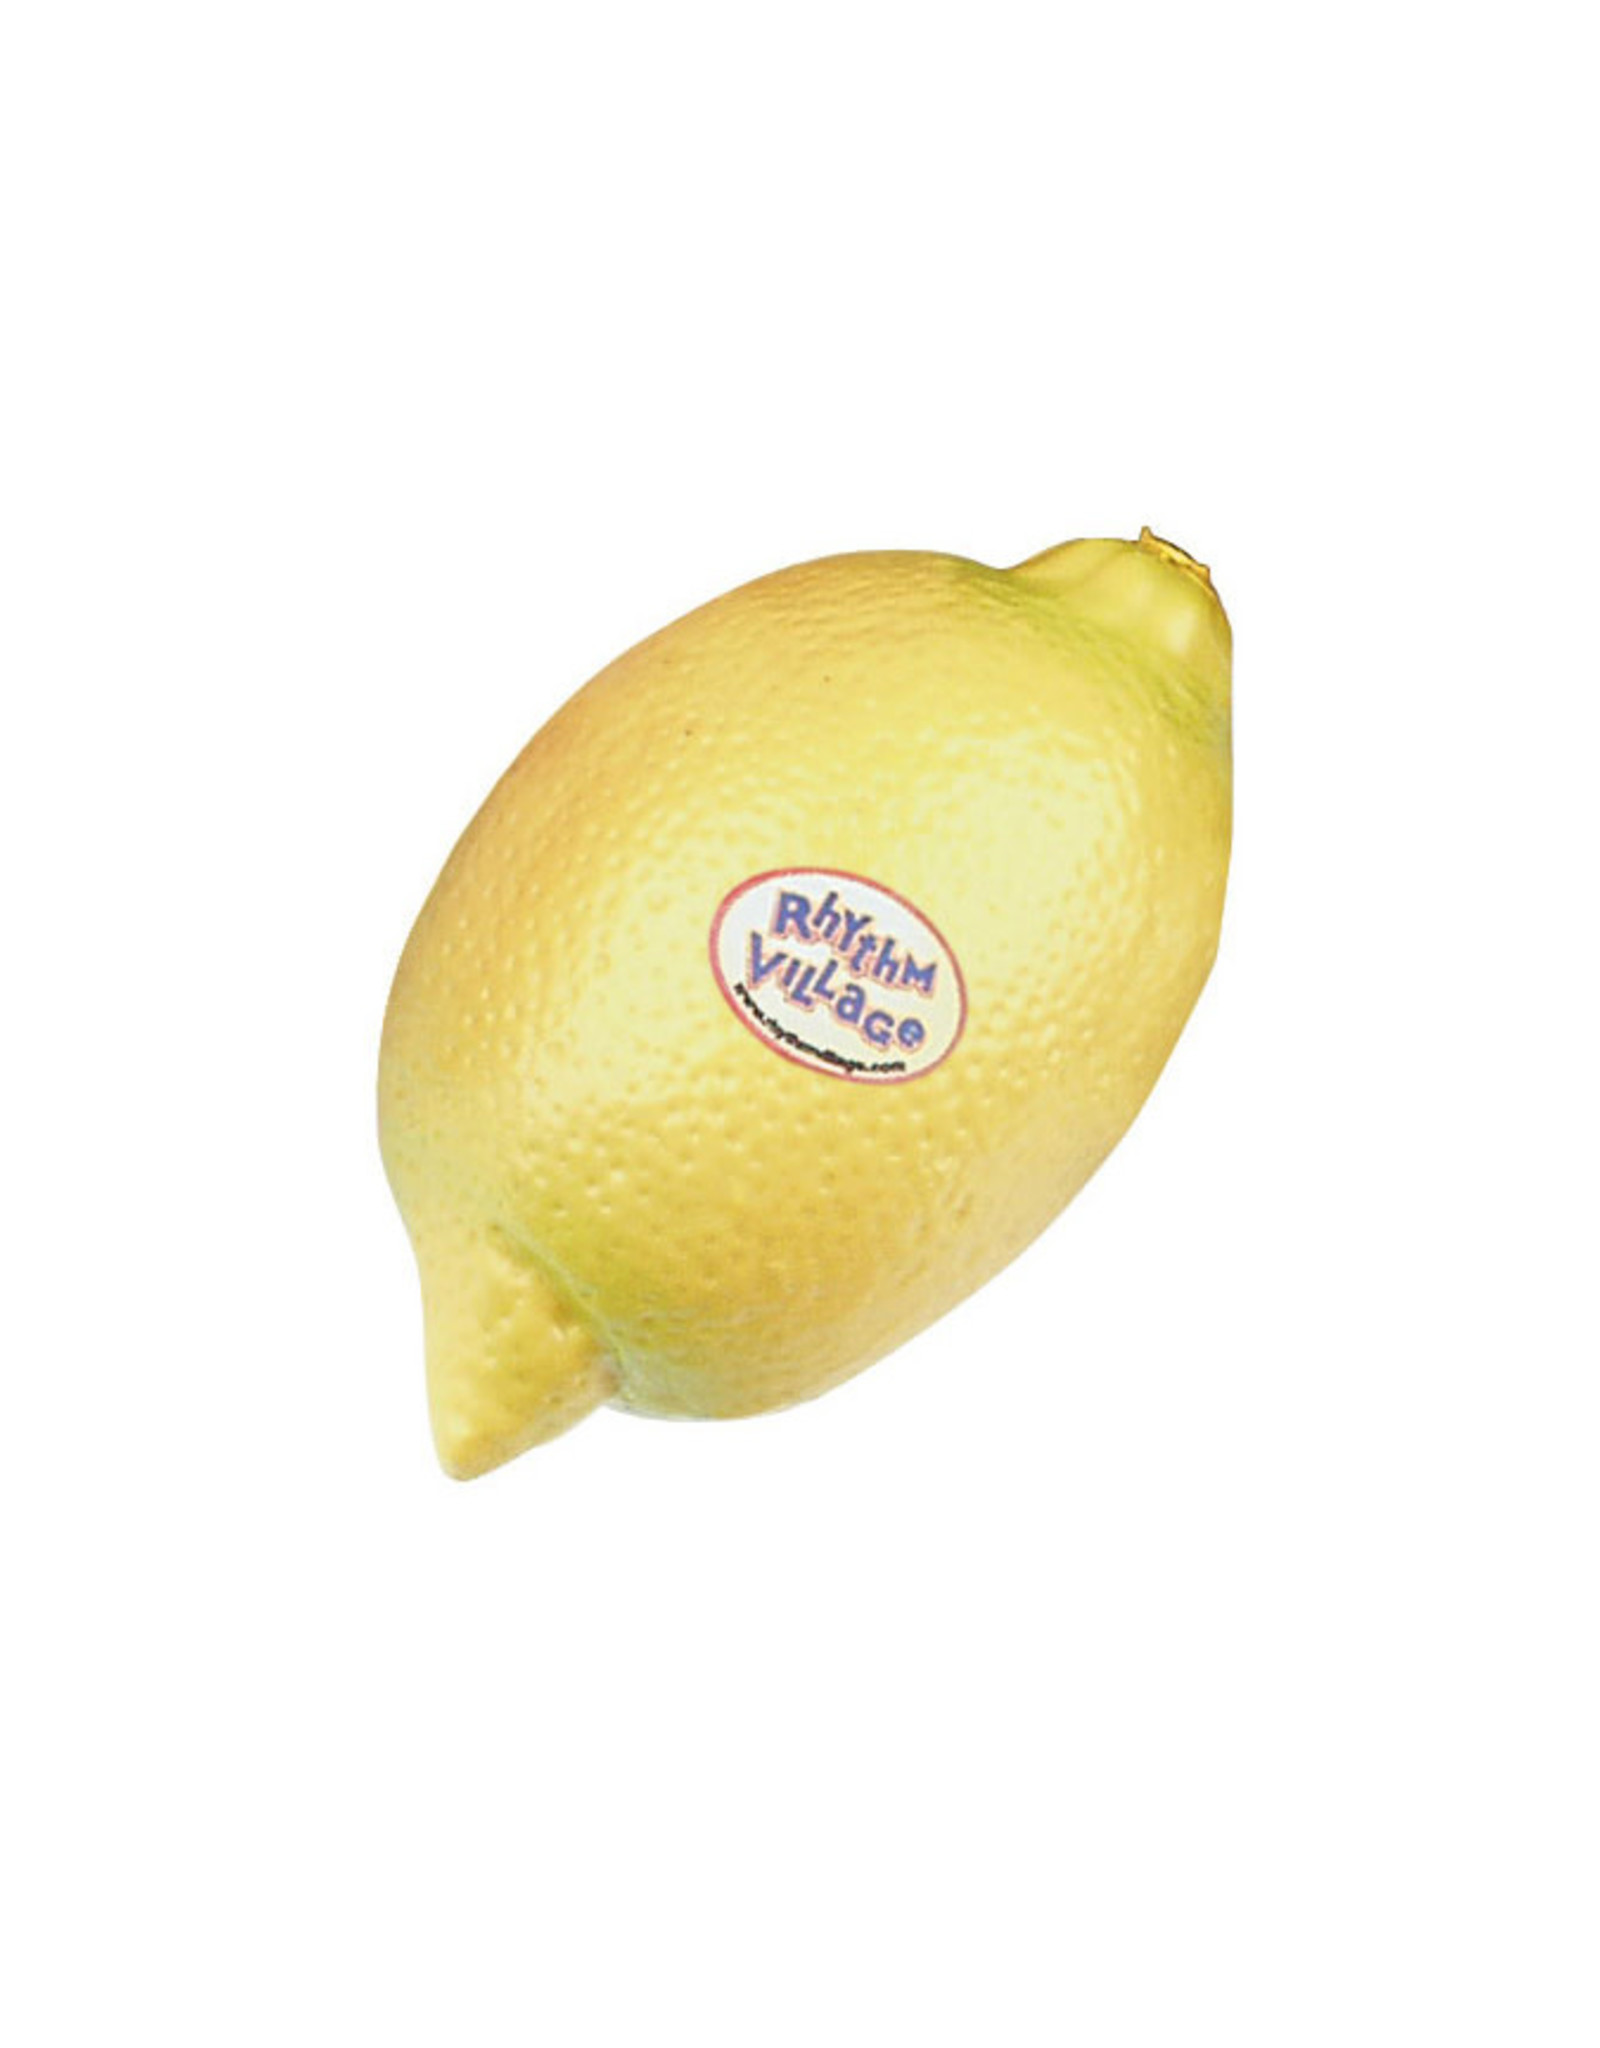 Rhythm Tech Rhythm Tech Fruit Shaker, Lemon